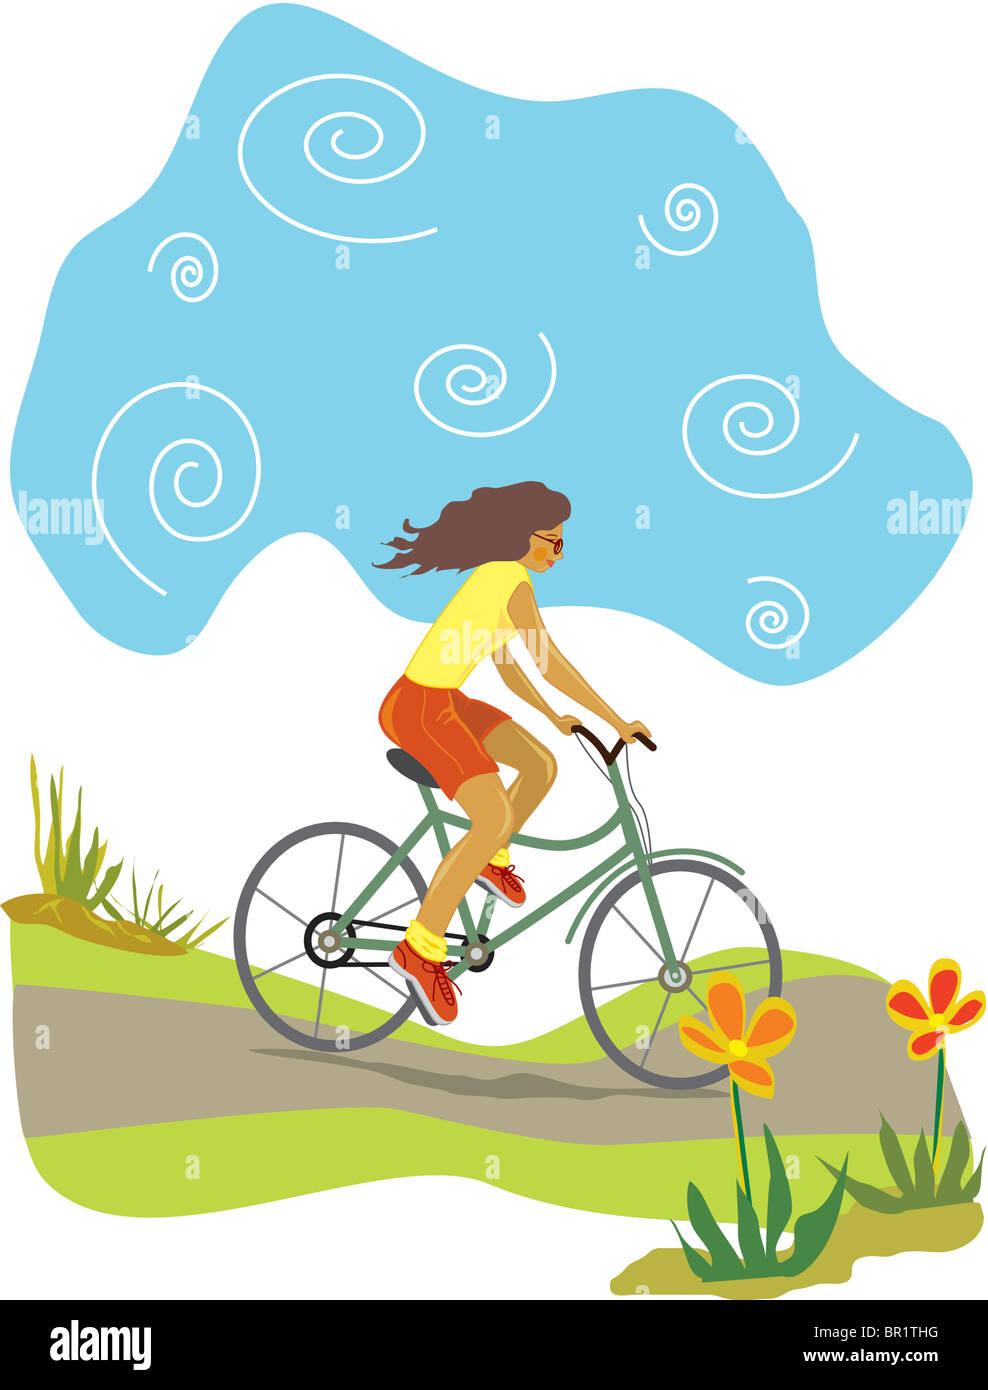 A woman riding her bike downhill Stock Photo